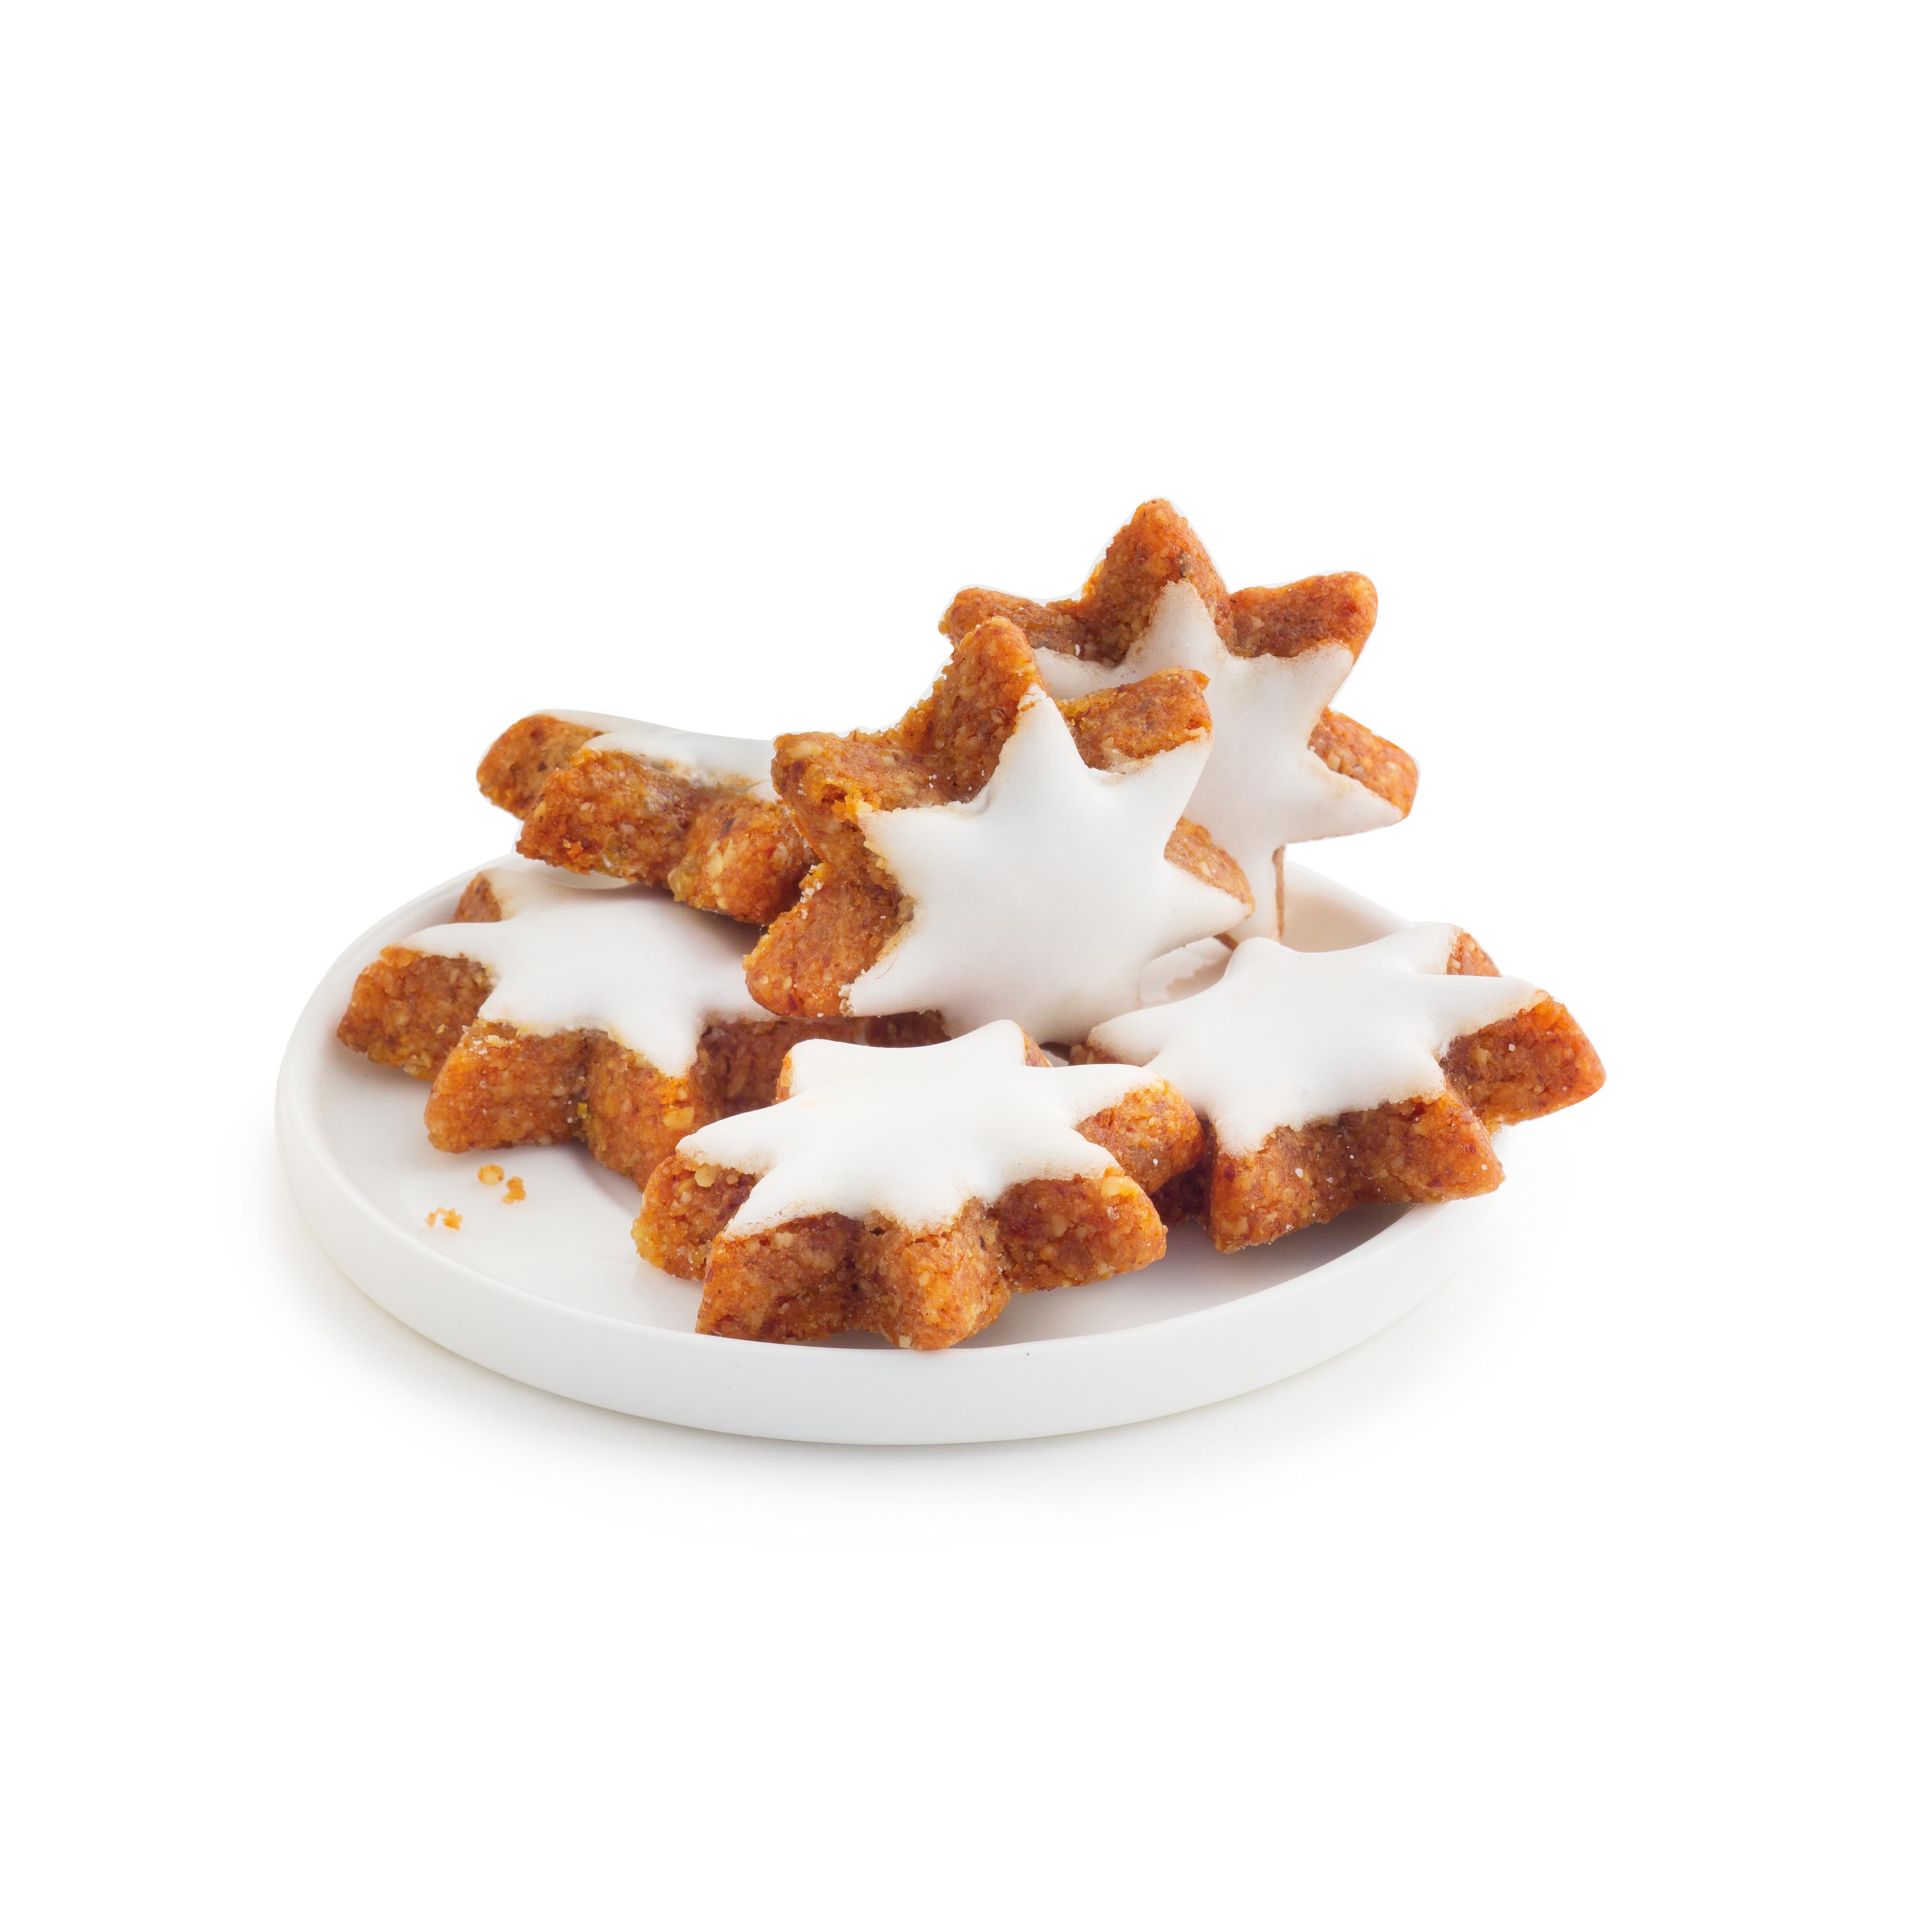 gourmandise sucree salee noel 2016 picard biscuits etoile. Black Bedroom Furniture Sets. Home Design Ideas